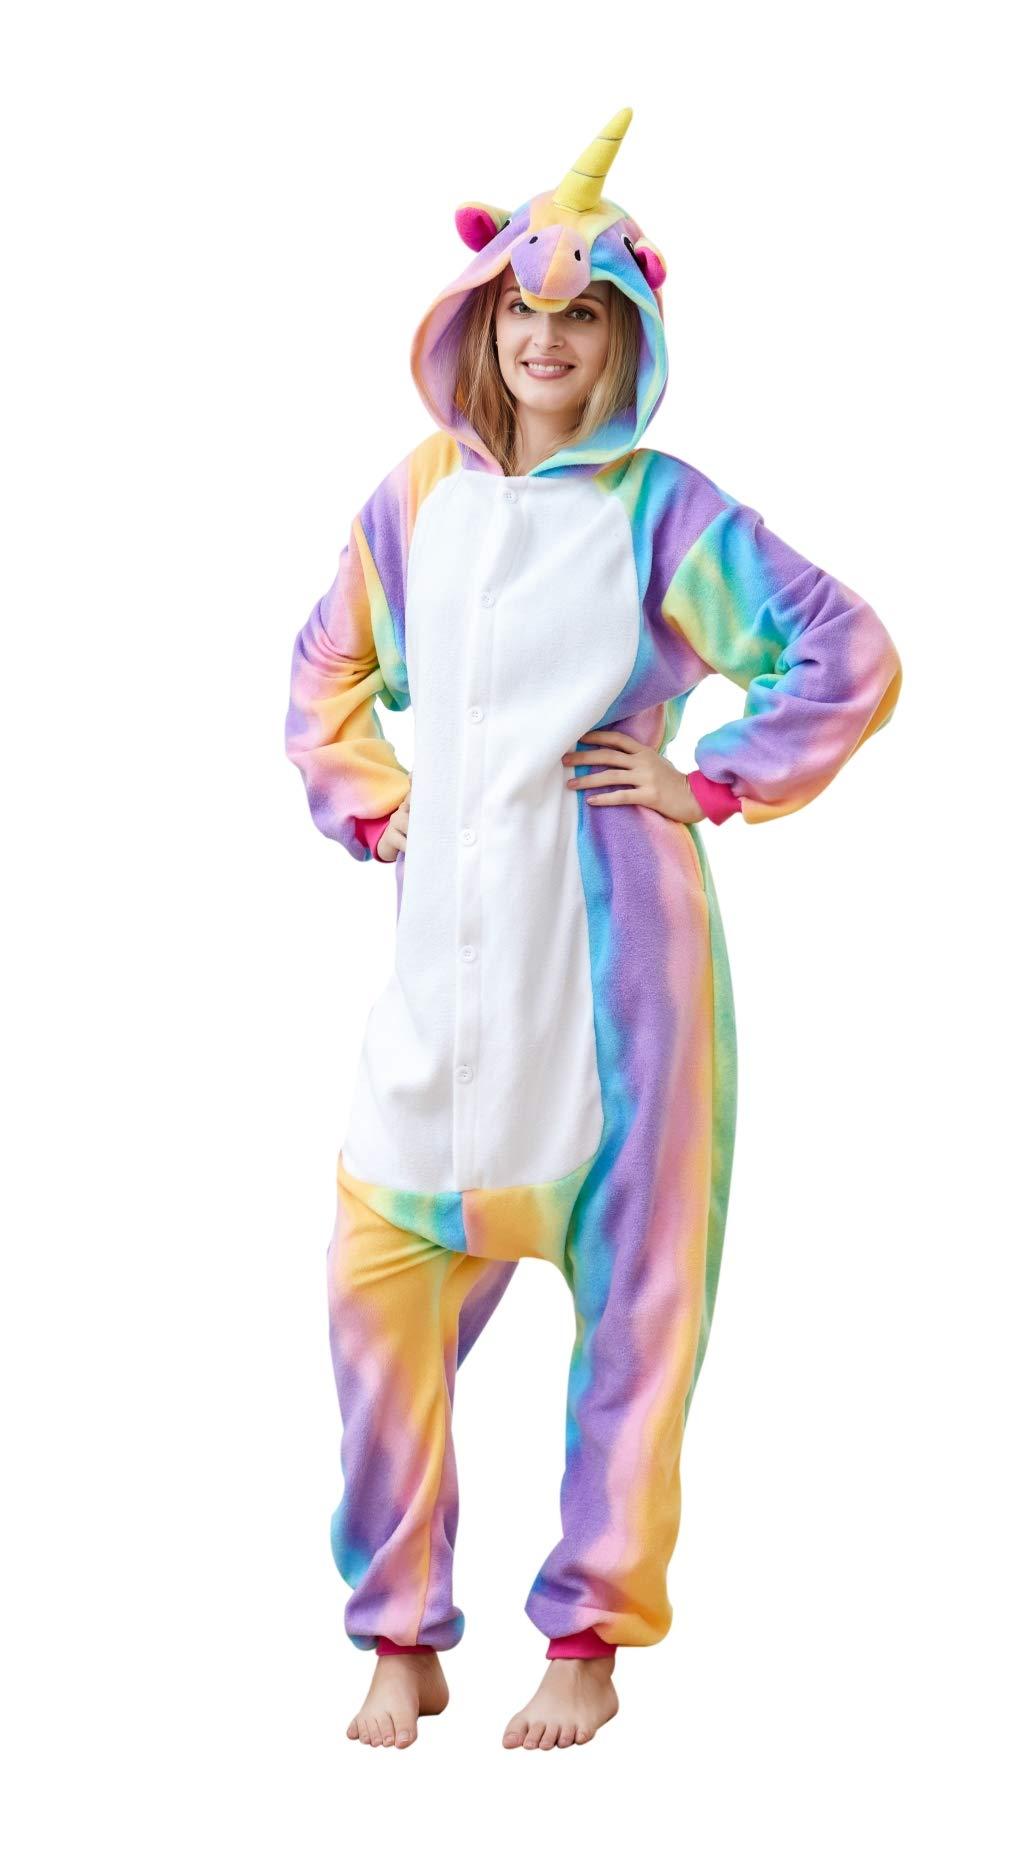 Goldtry Soft Flannel Multi-Colors Unicorn Onesie Gift Cute Teens Cosplay Costumes Pajamas Rainbow Medium